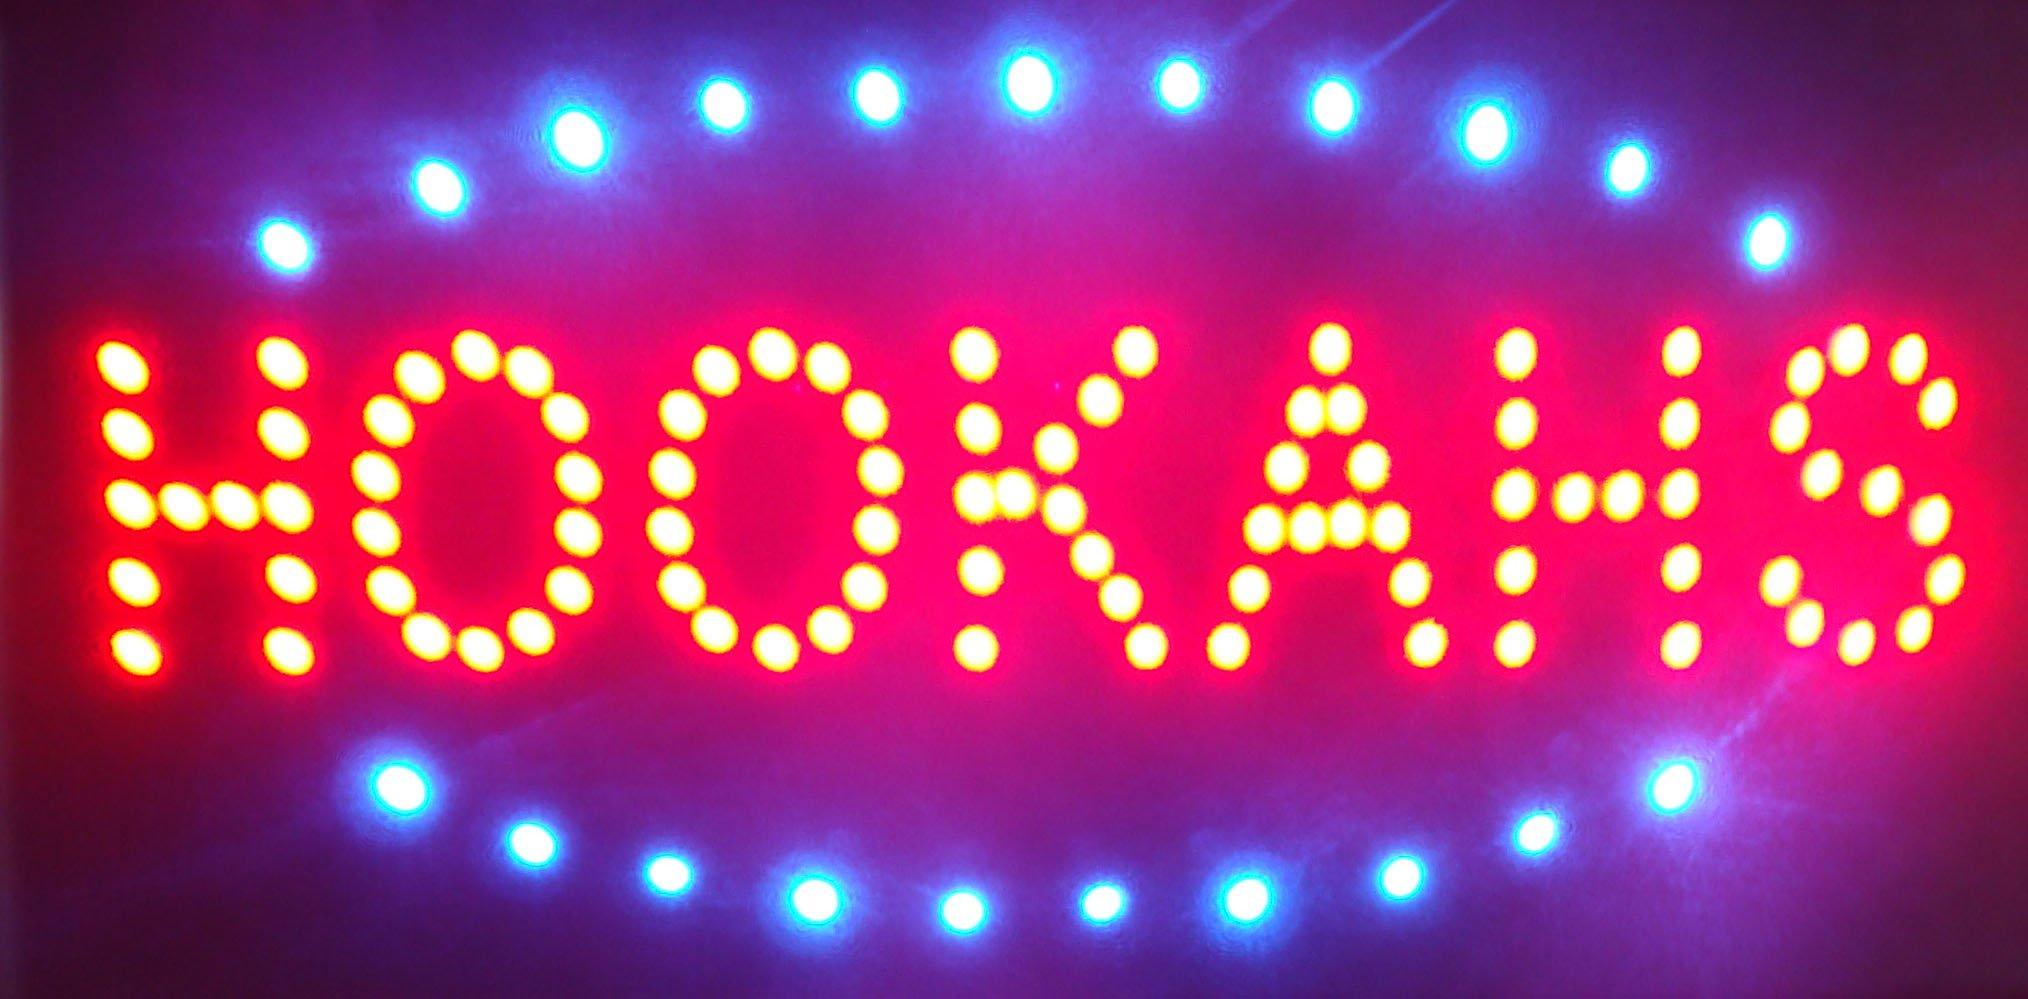 CHENXI Led Neon Vape Shop/Vapor E-cigarettes/ Vape Eliquids/Tabacchi/Smoke Shop/Hookahs/E-liquid/E cigs/E-cigarette Open Store Signs Vape E-liquid Sign Board Indoor (48 X 25 CM, HOOKAHS)